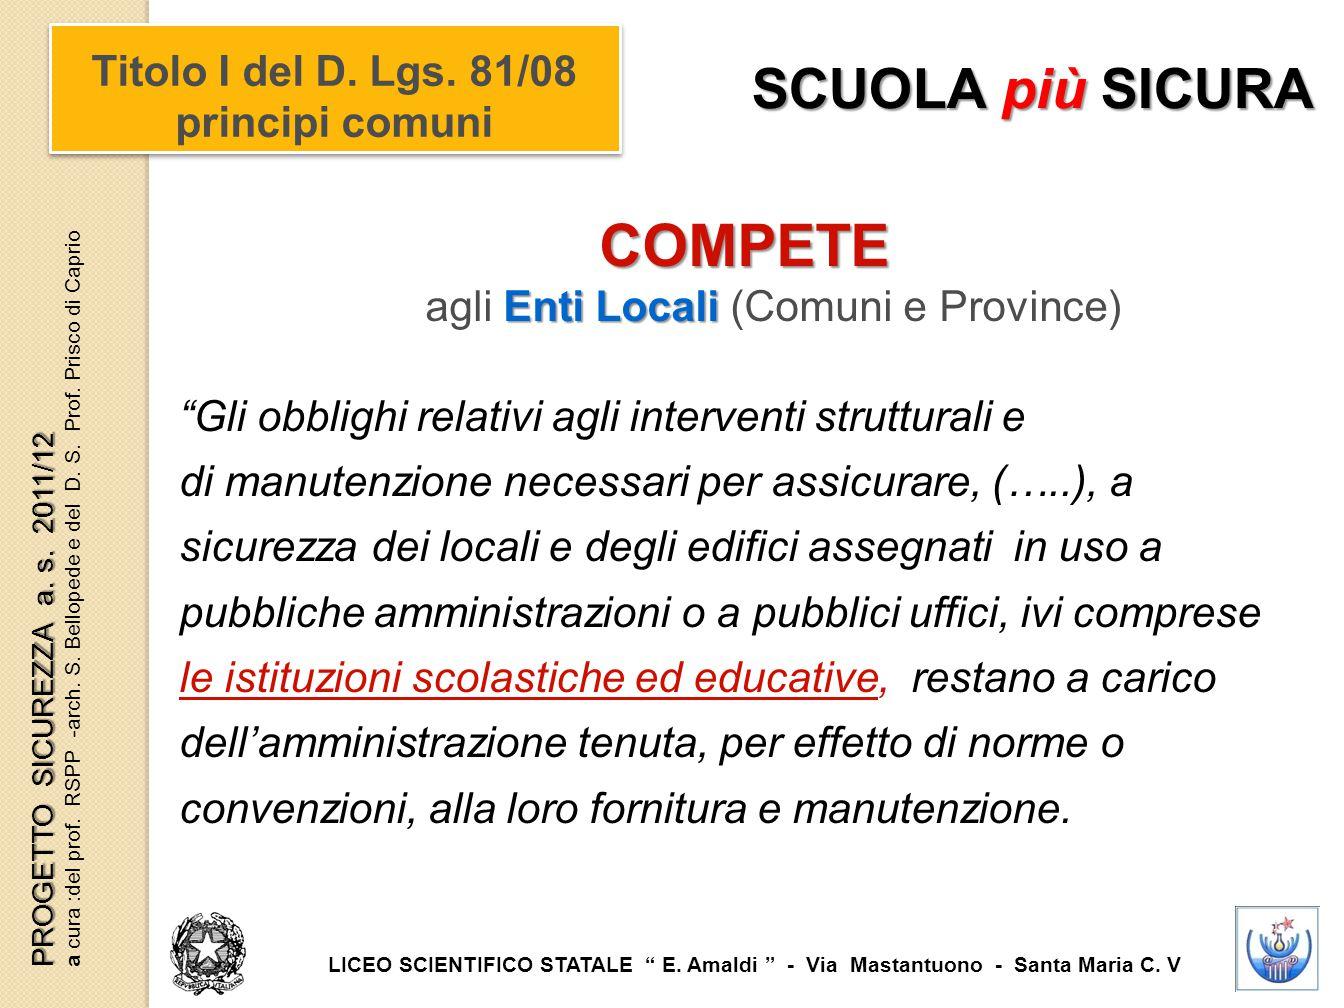 Titolo I del D.Lgs. 81/08 – principi comuni ai sensi dell'art.